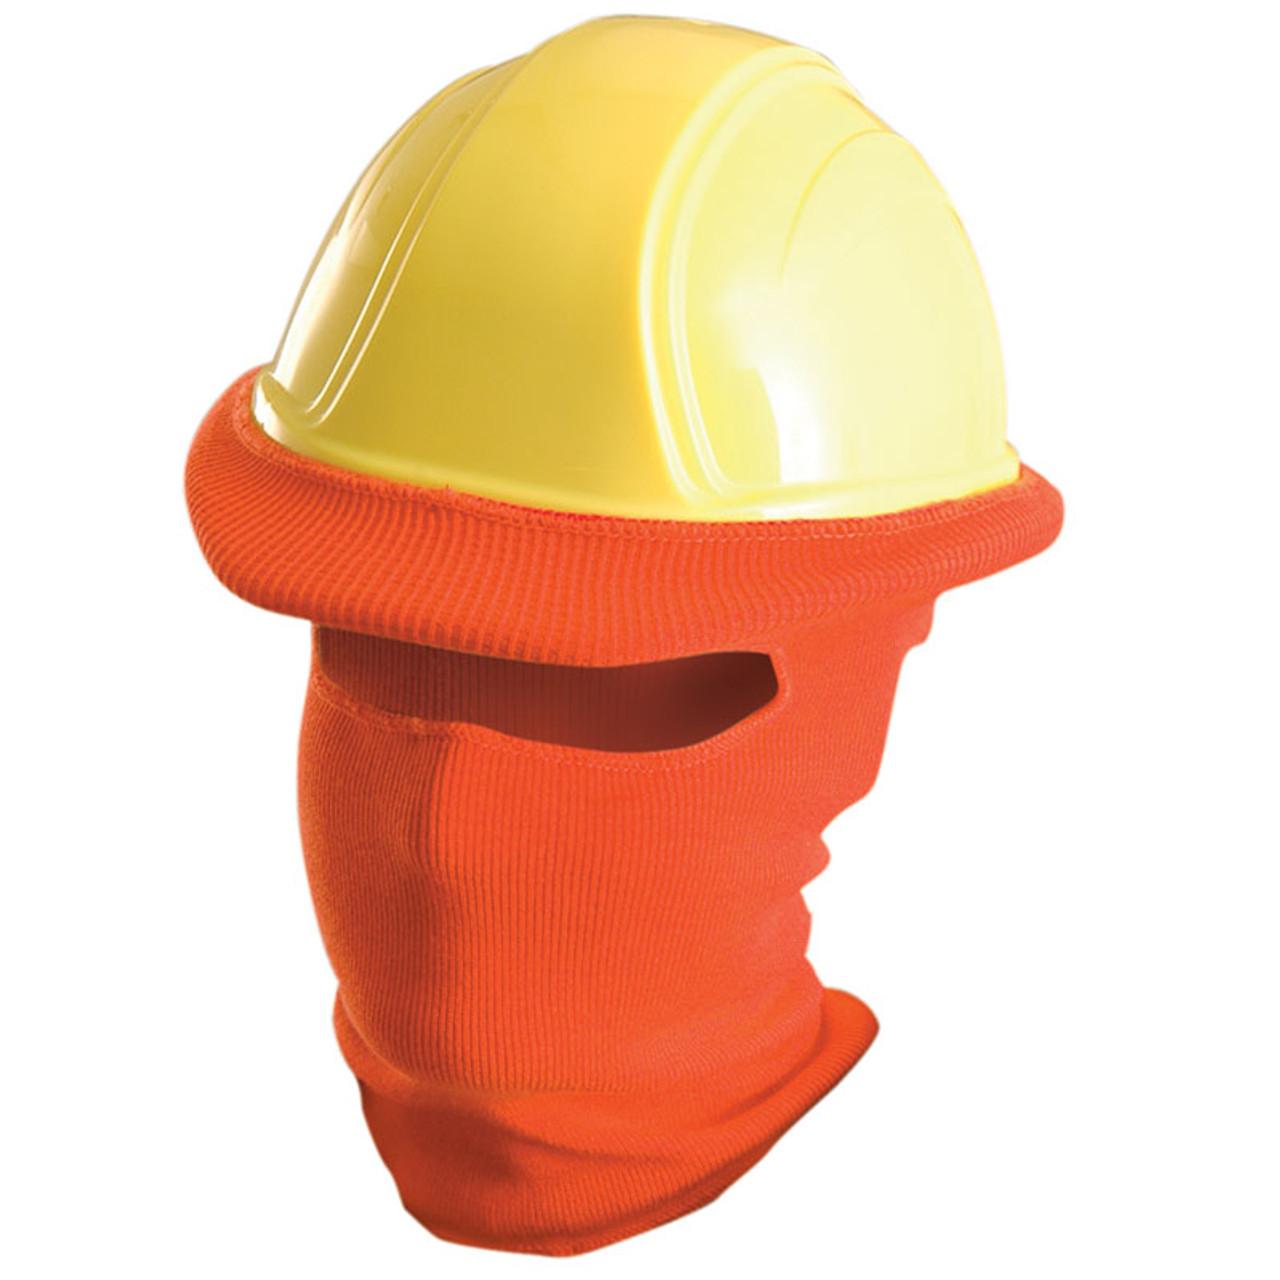 Occunomix Full Face Hard Hat Tube Liner LK810 Orange e5a6337afa6a